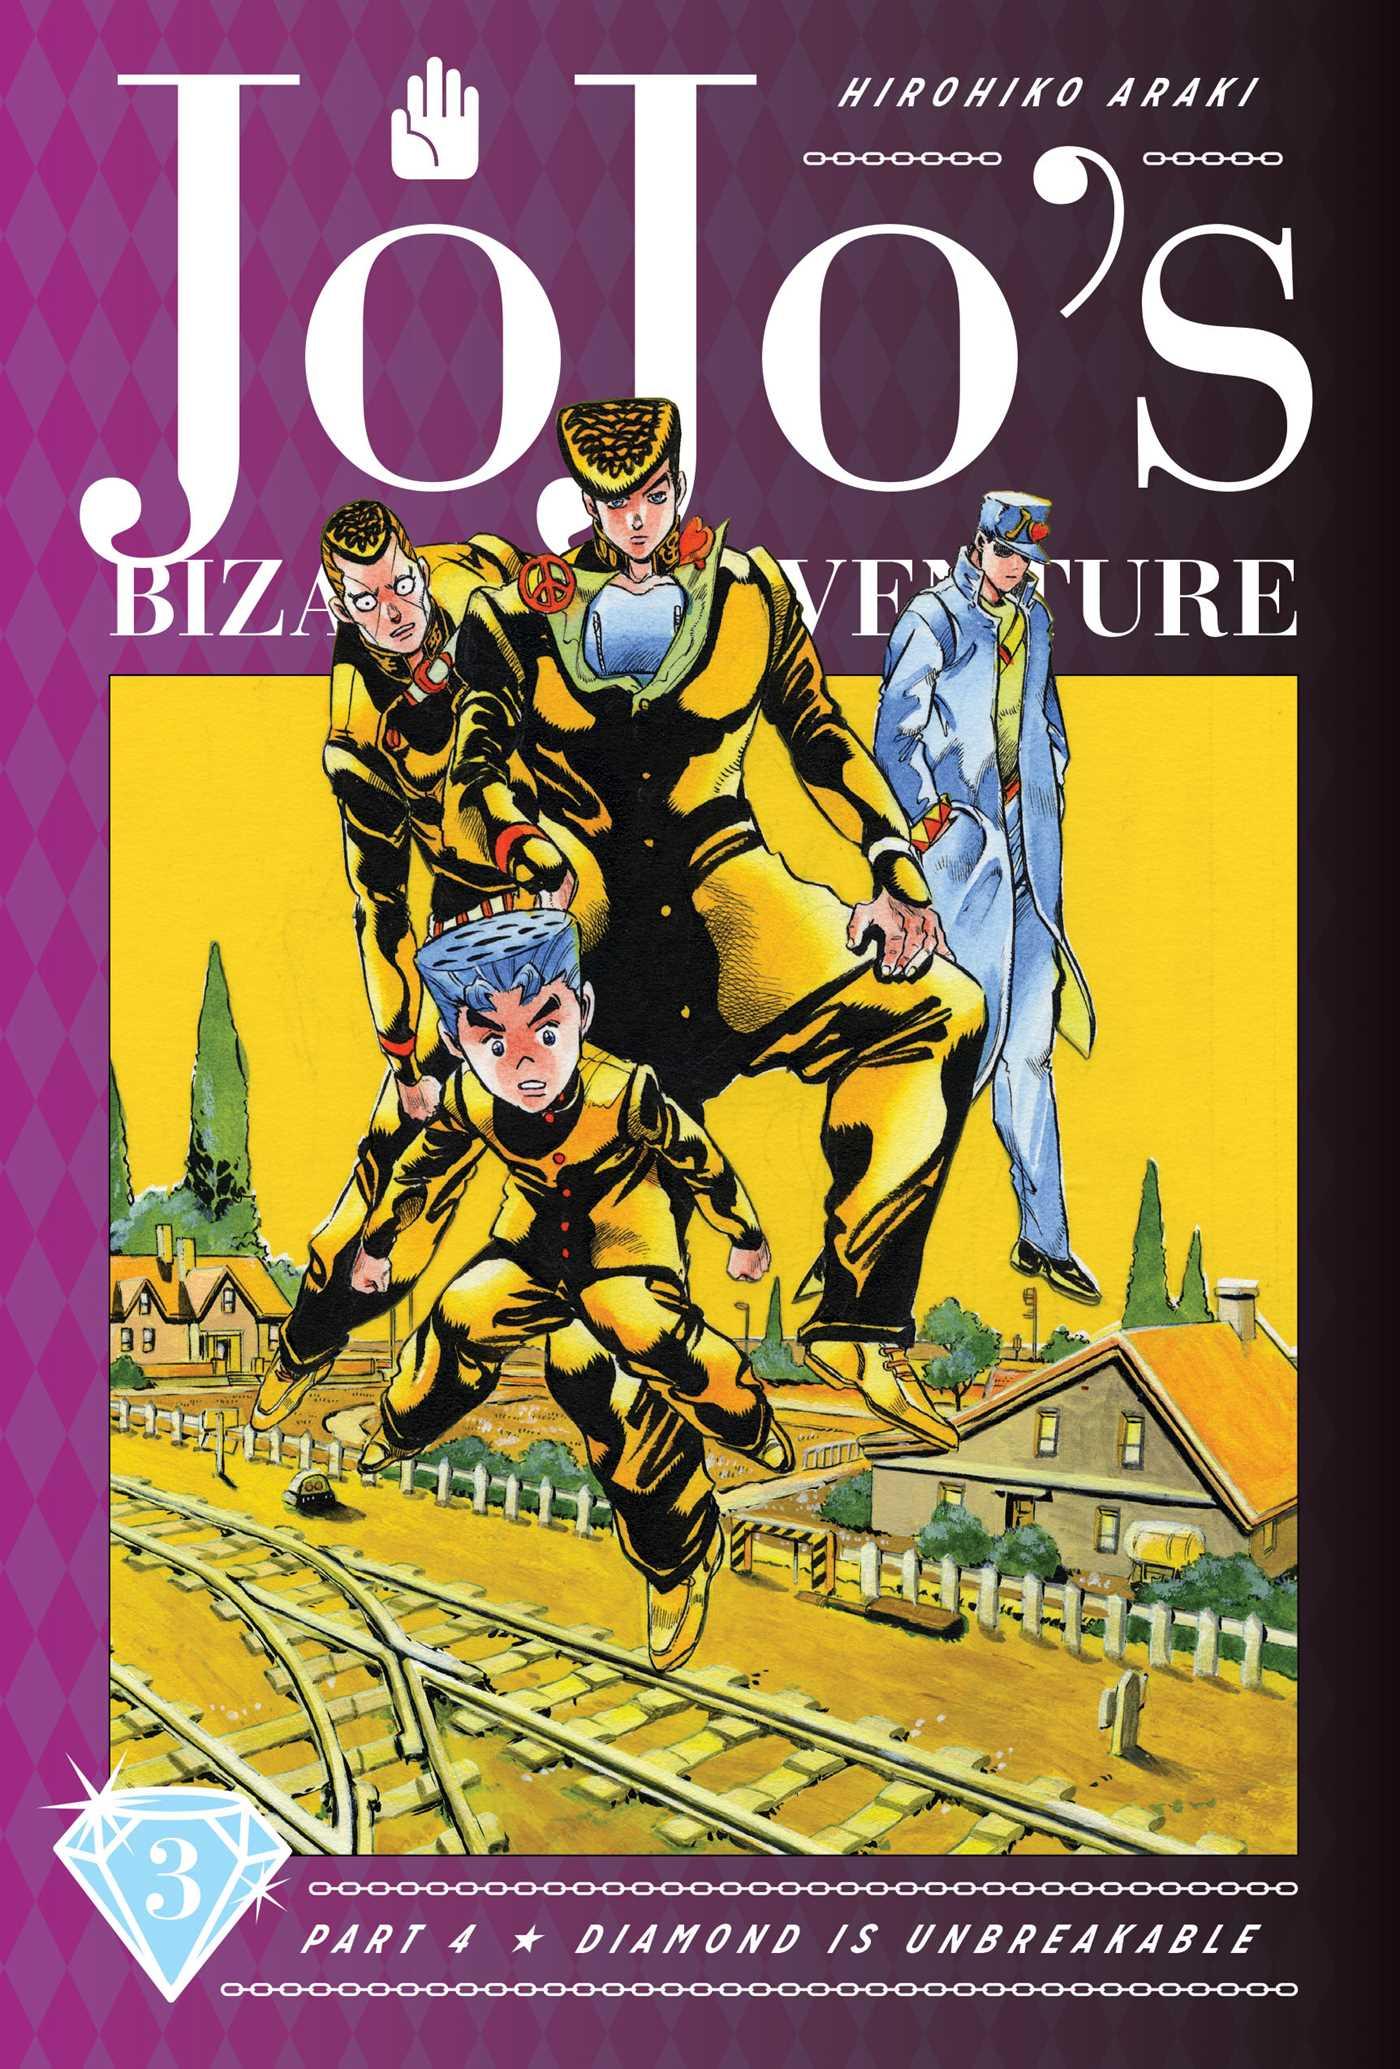 Jojo S Bizarre Adventure Part 4 Diamond Is Unbreakable Vol 3 Book By Hirohiko Araki Official Publisher Page Simon Schuster